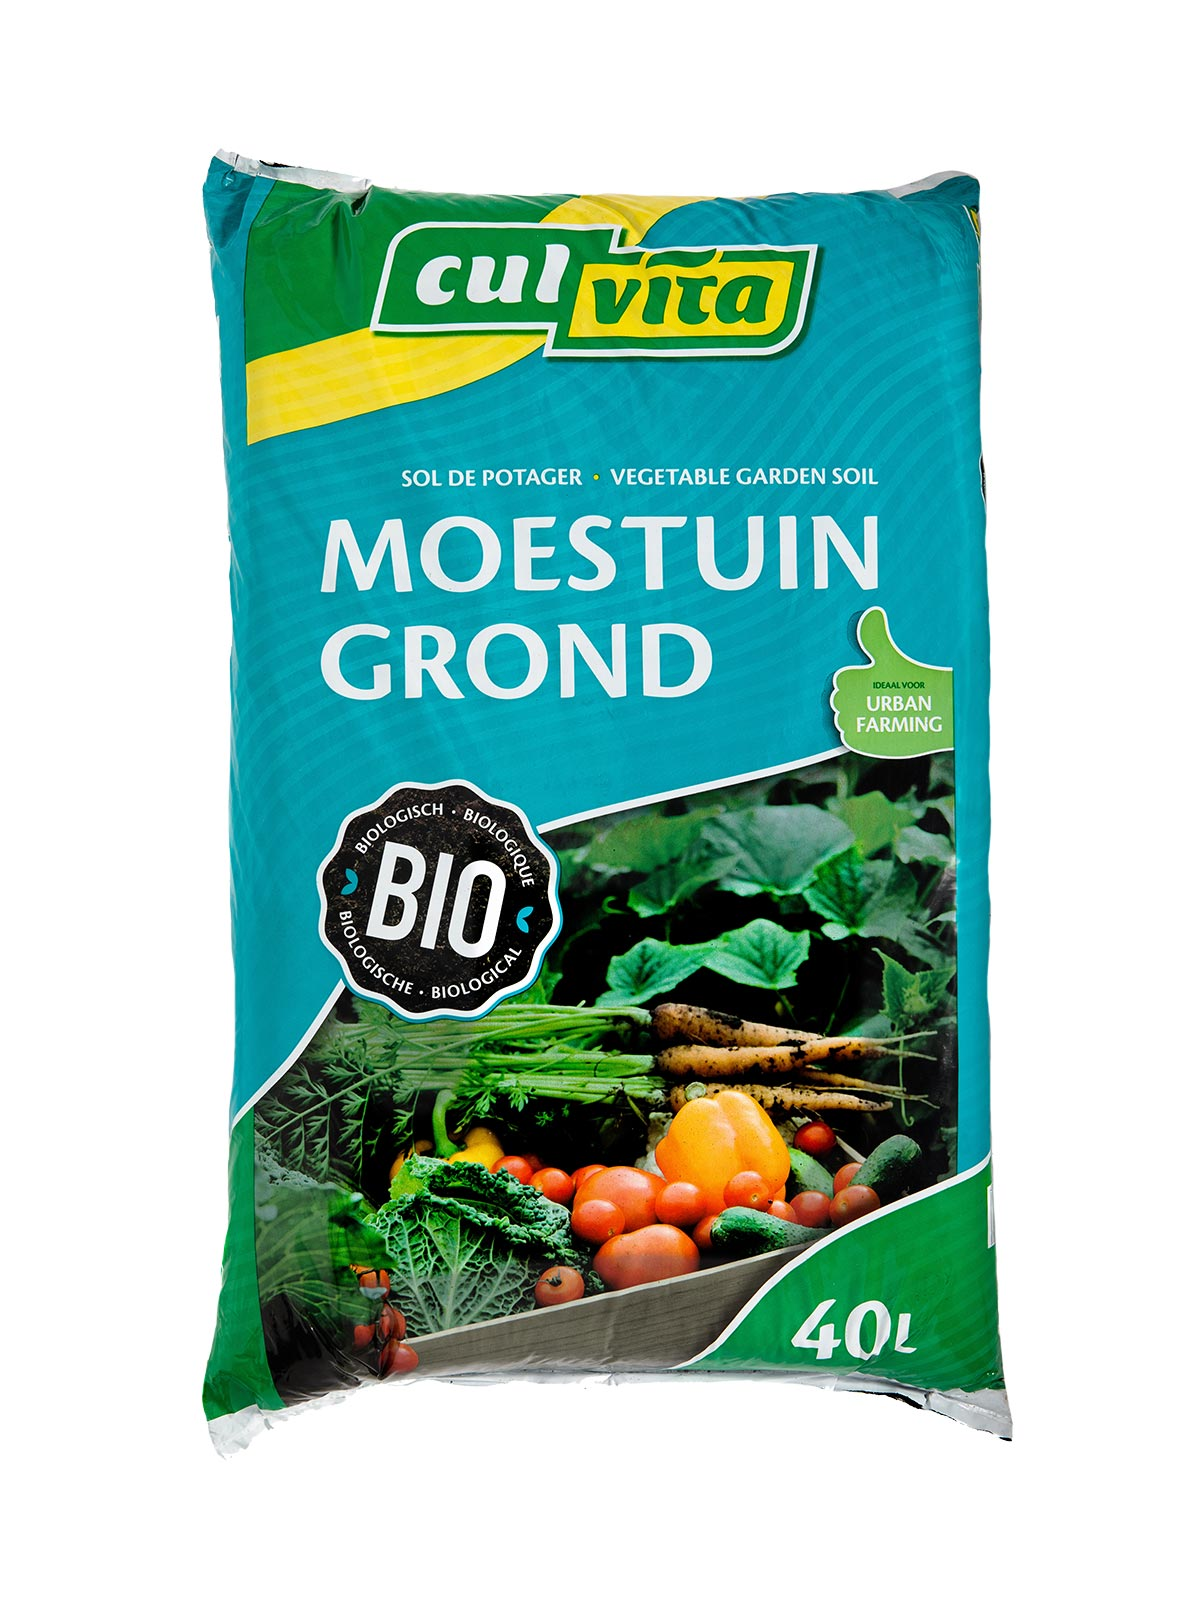 Culvita Biologische Moestuingrond | Culvita.nl